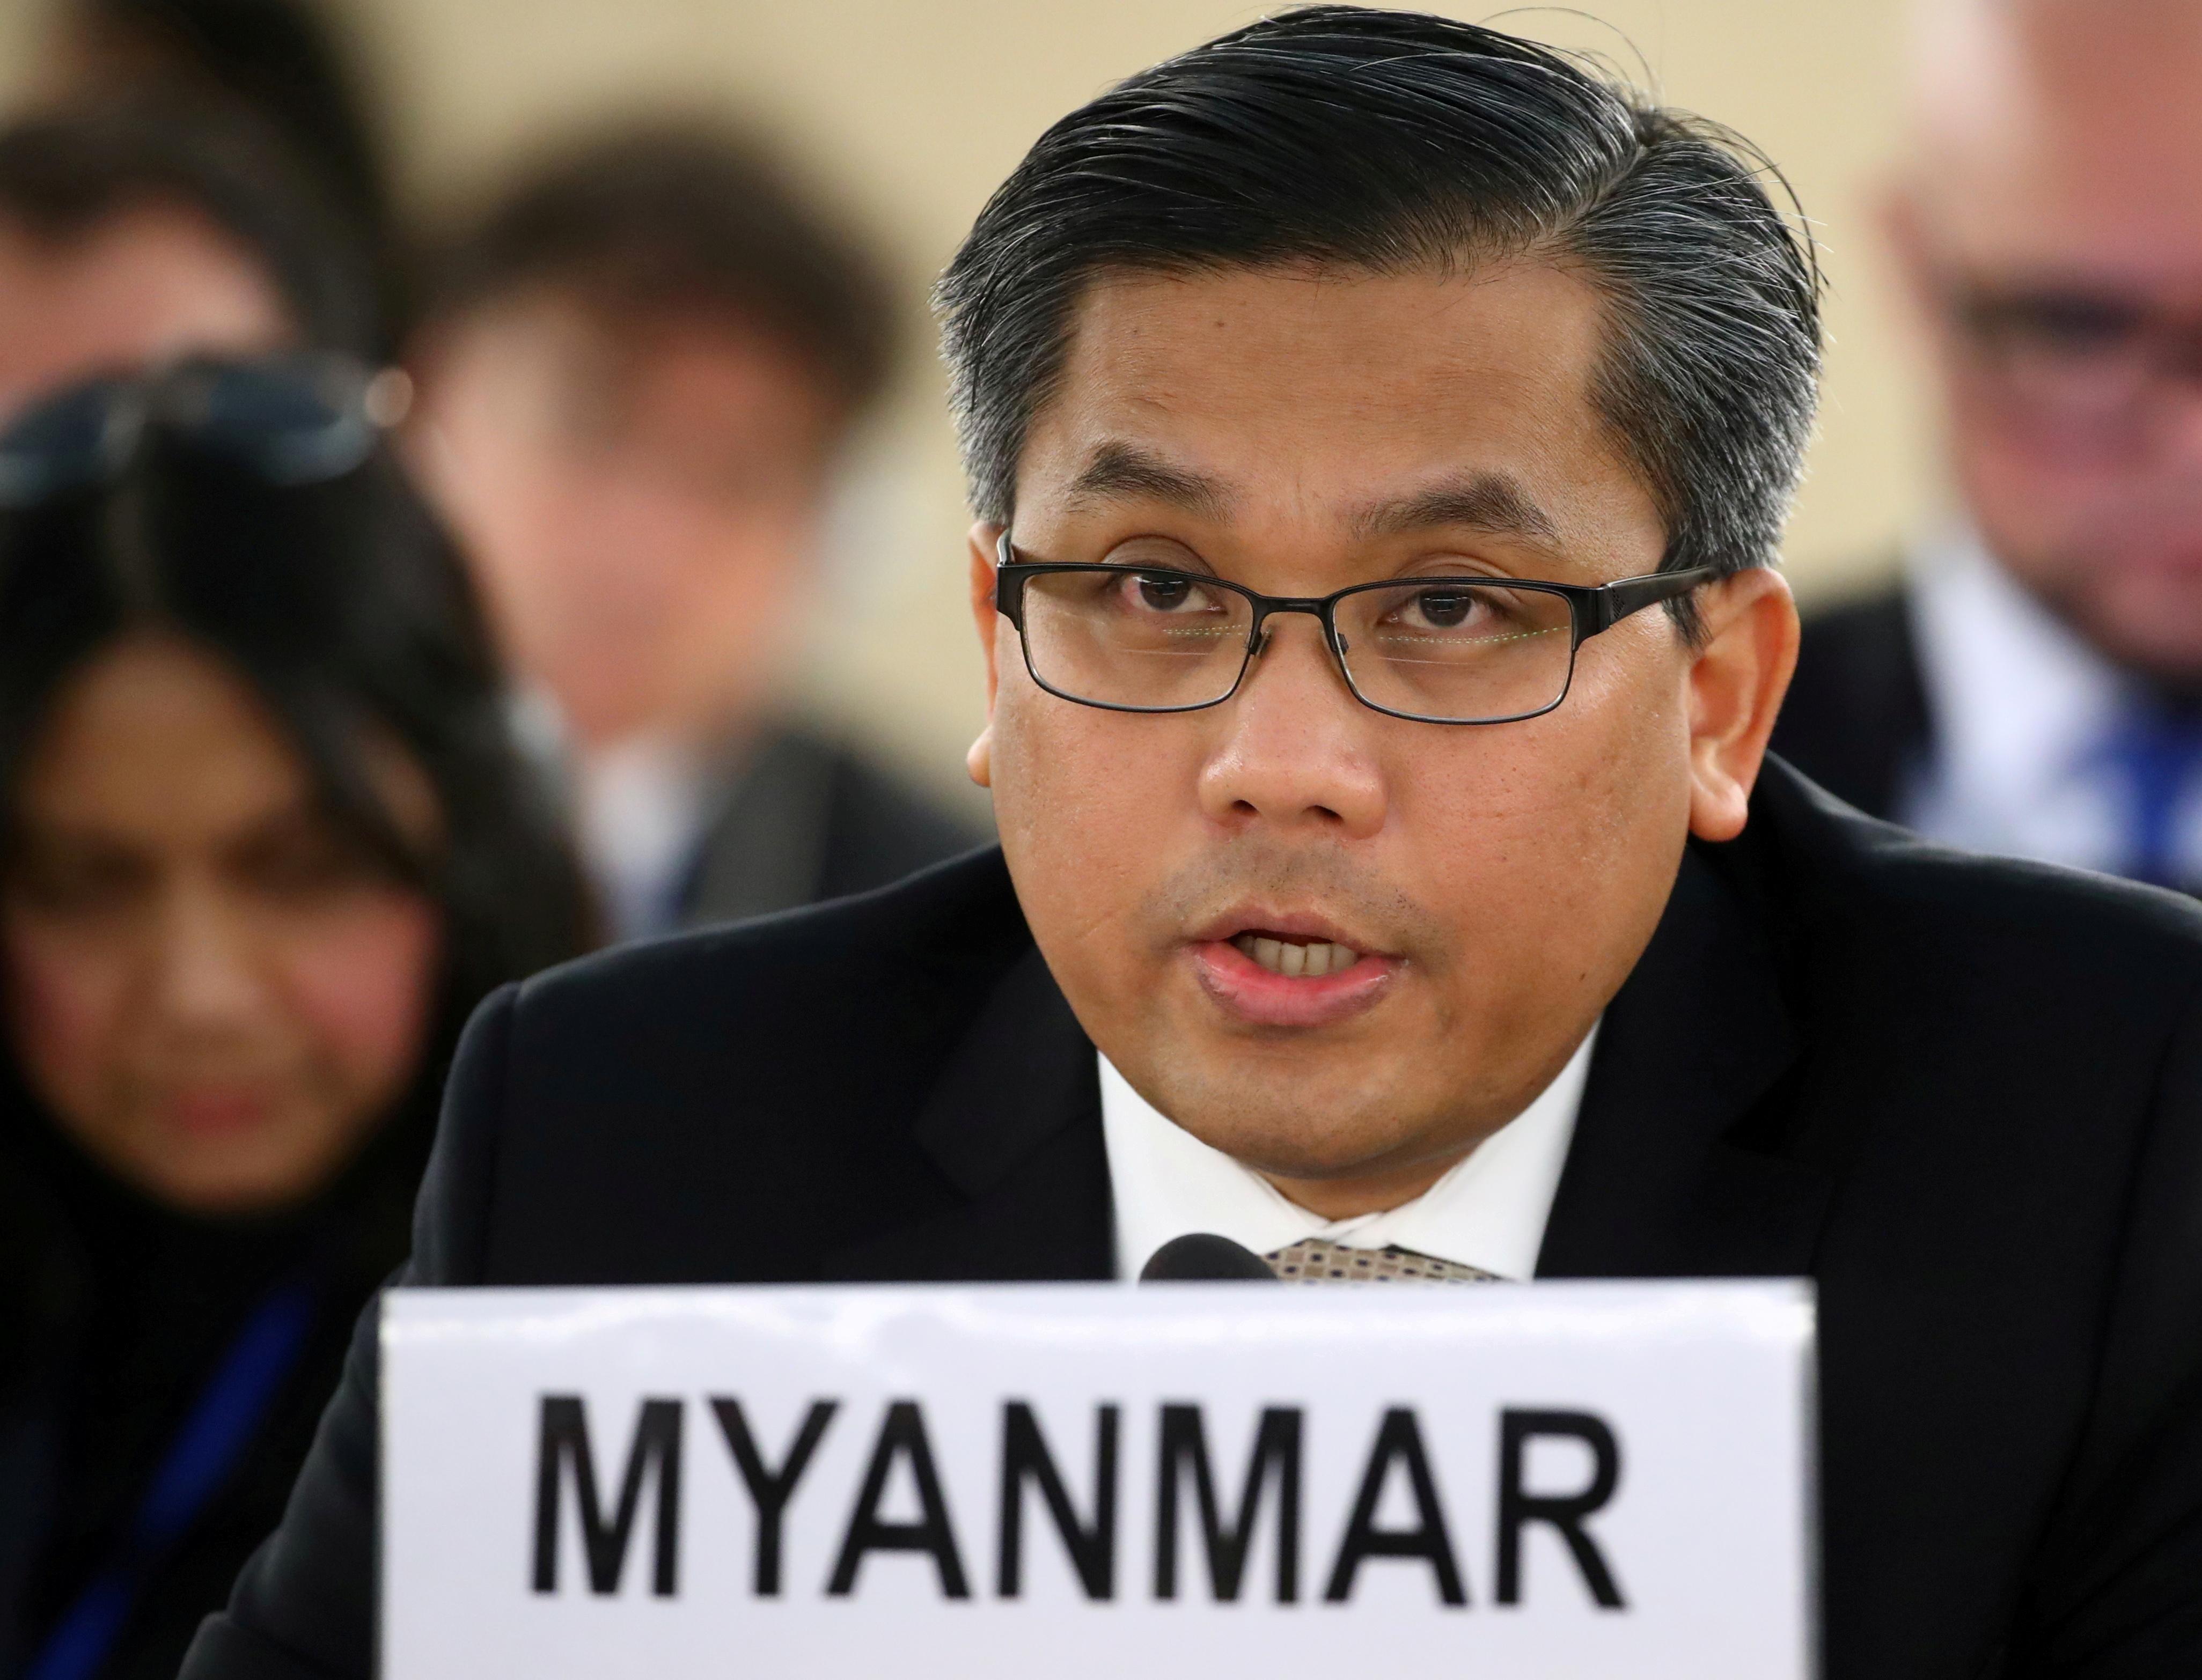 Myanmar's United Nations ambassador Kyaw Moe Tun addresses the U.N. Human Rights Council in Geneva, Switzerland, March 11, 2019. REUTERS/Denis Balibouse/File Photo